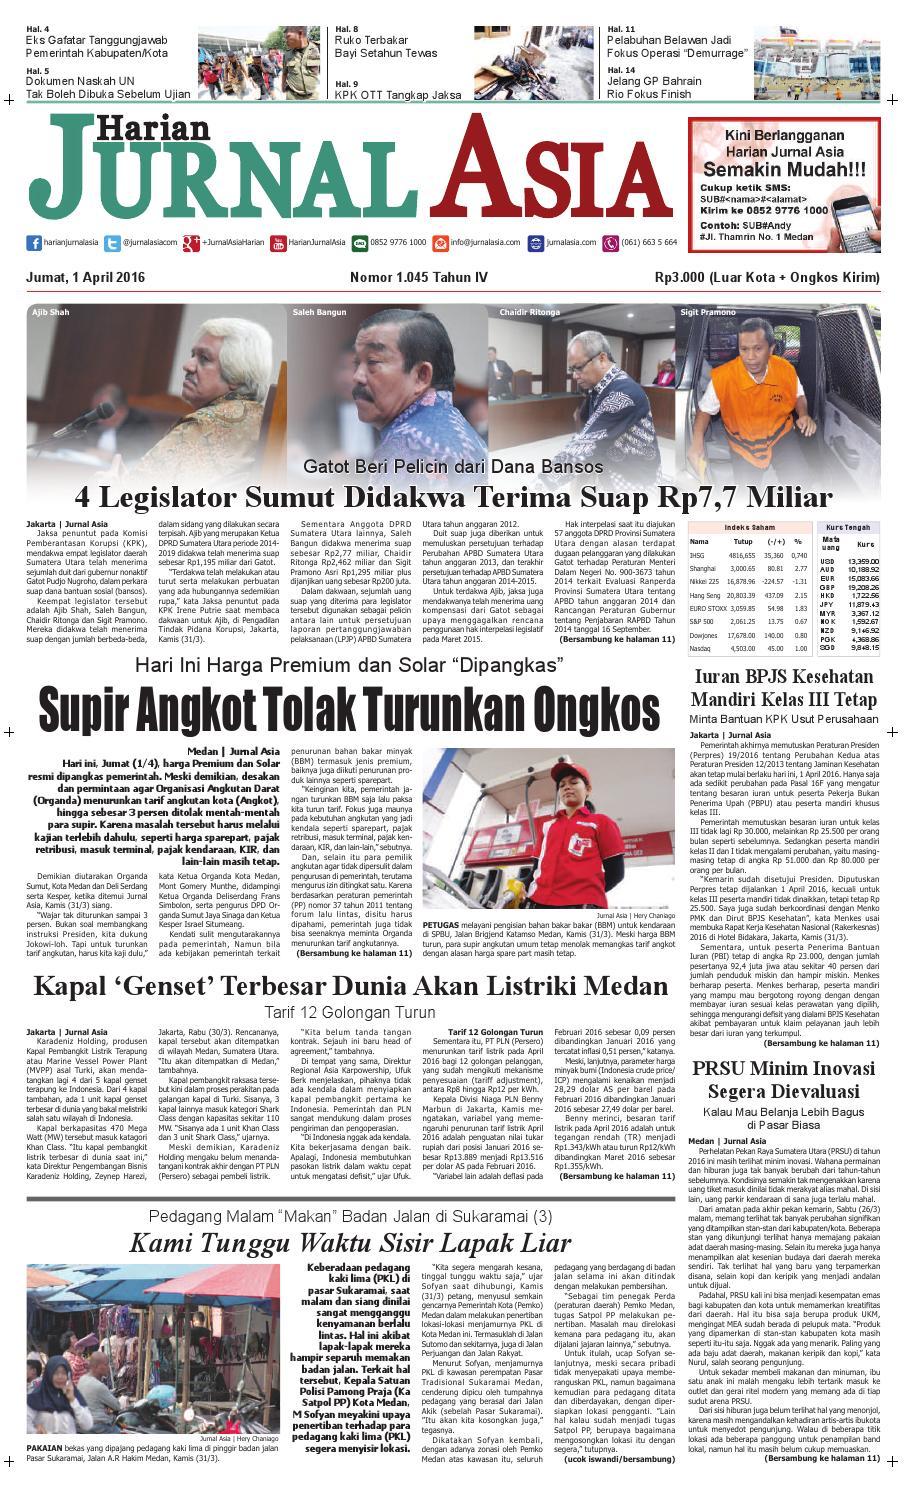 Harian Jurnal Asia Edisi Jumat 01 April 2016 By Produk Ukm Bumn Kain Batik Middle Premium 3 Bendera Medan Issuu